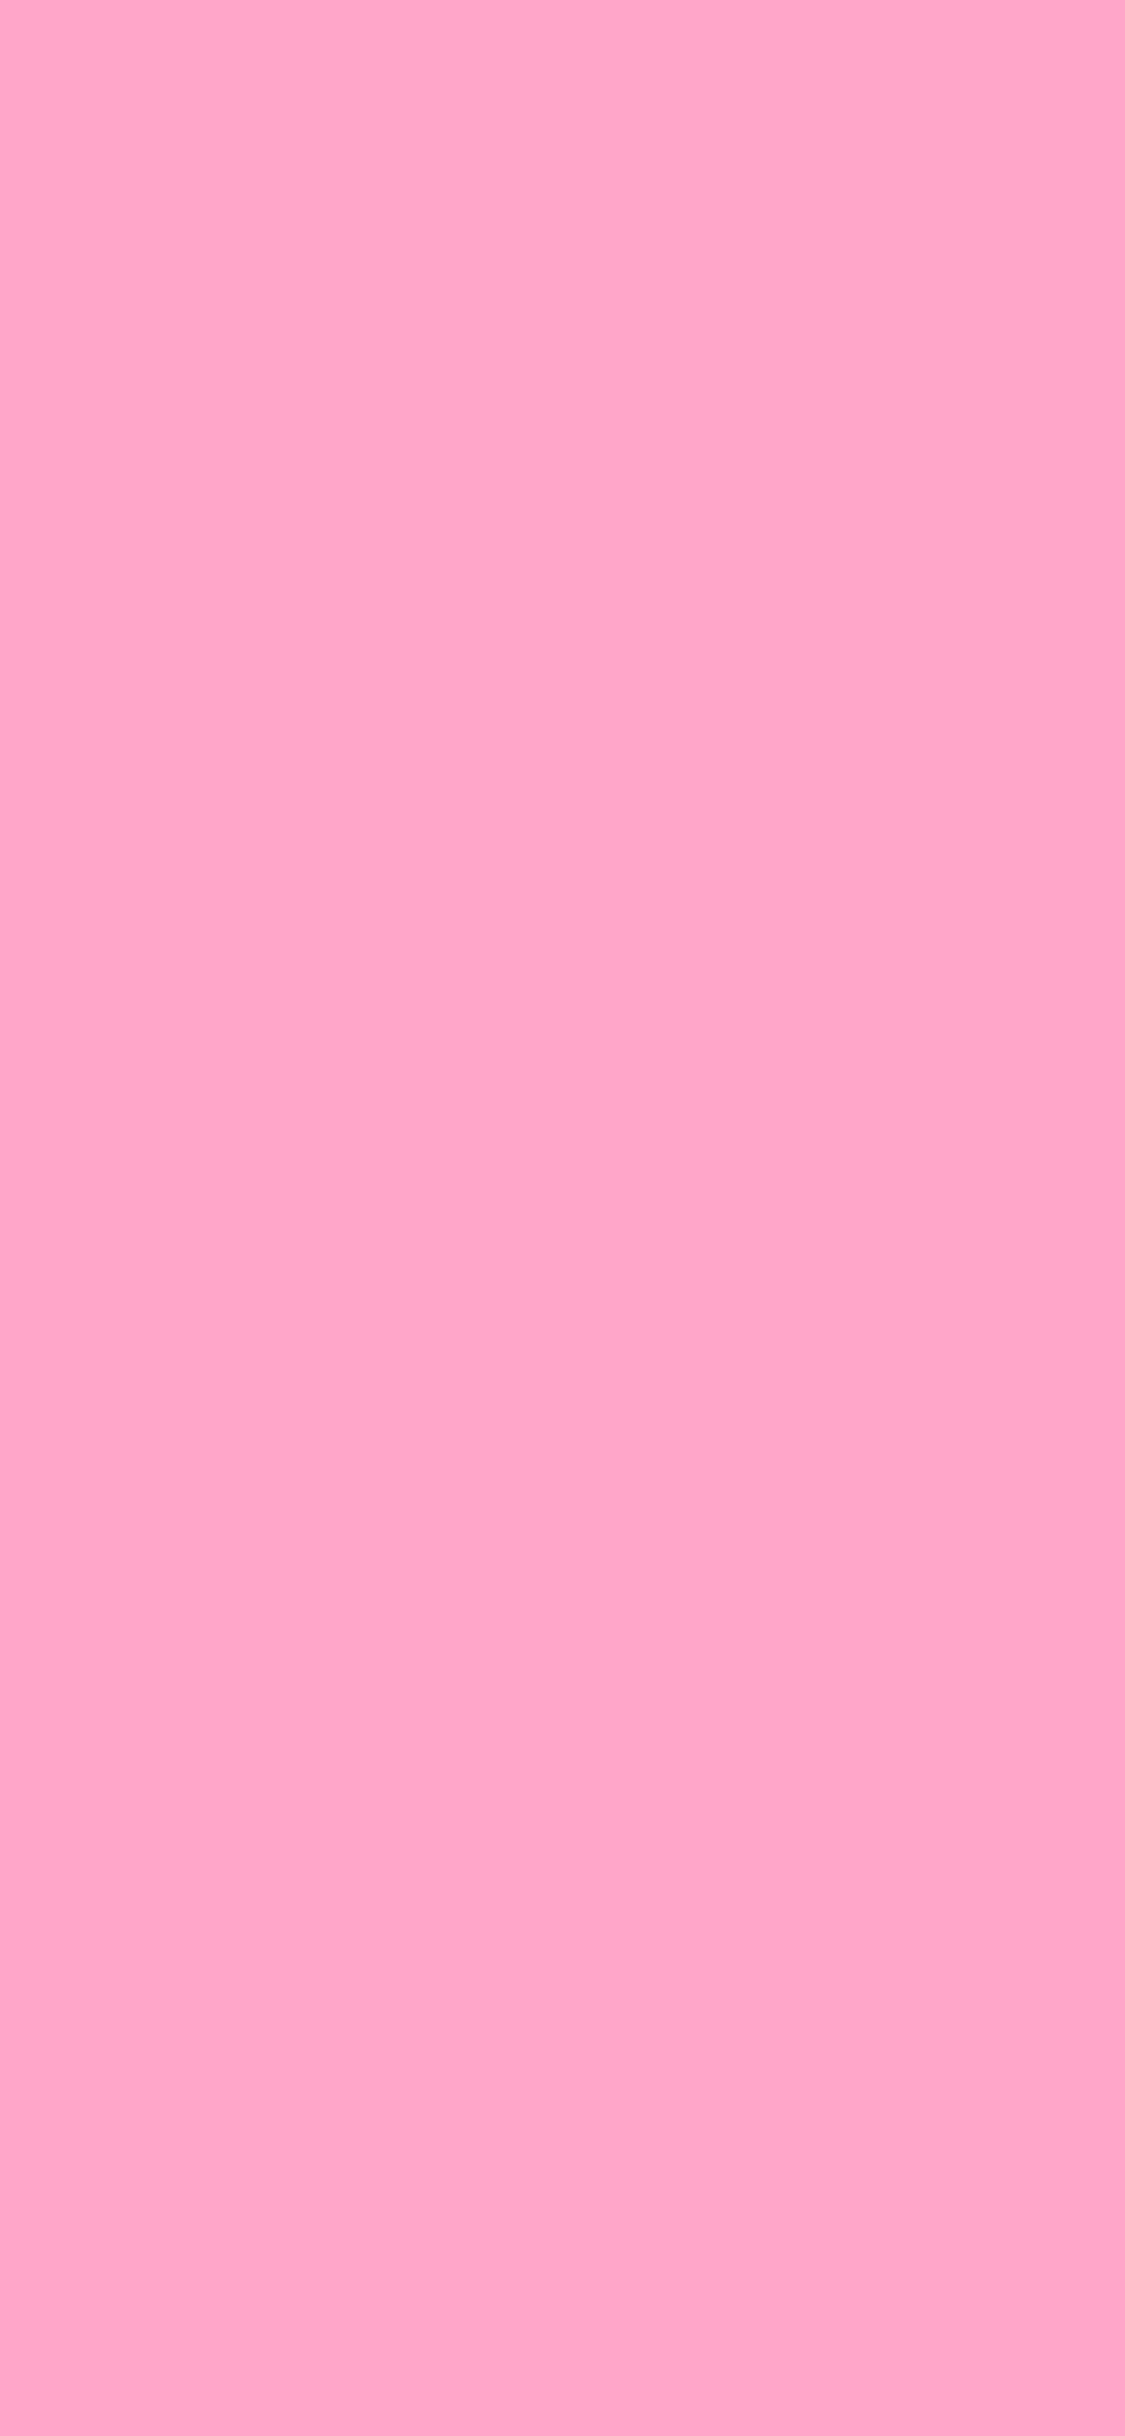 1125x2436 Carnation Pink Solid Color Background